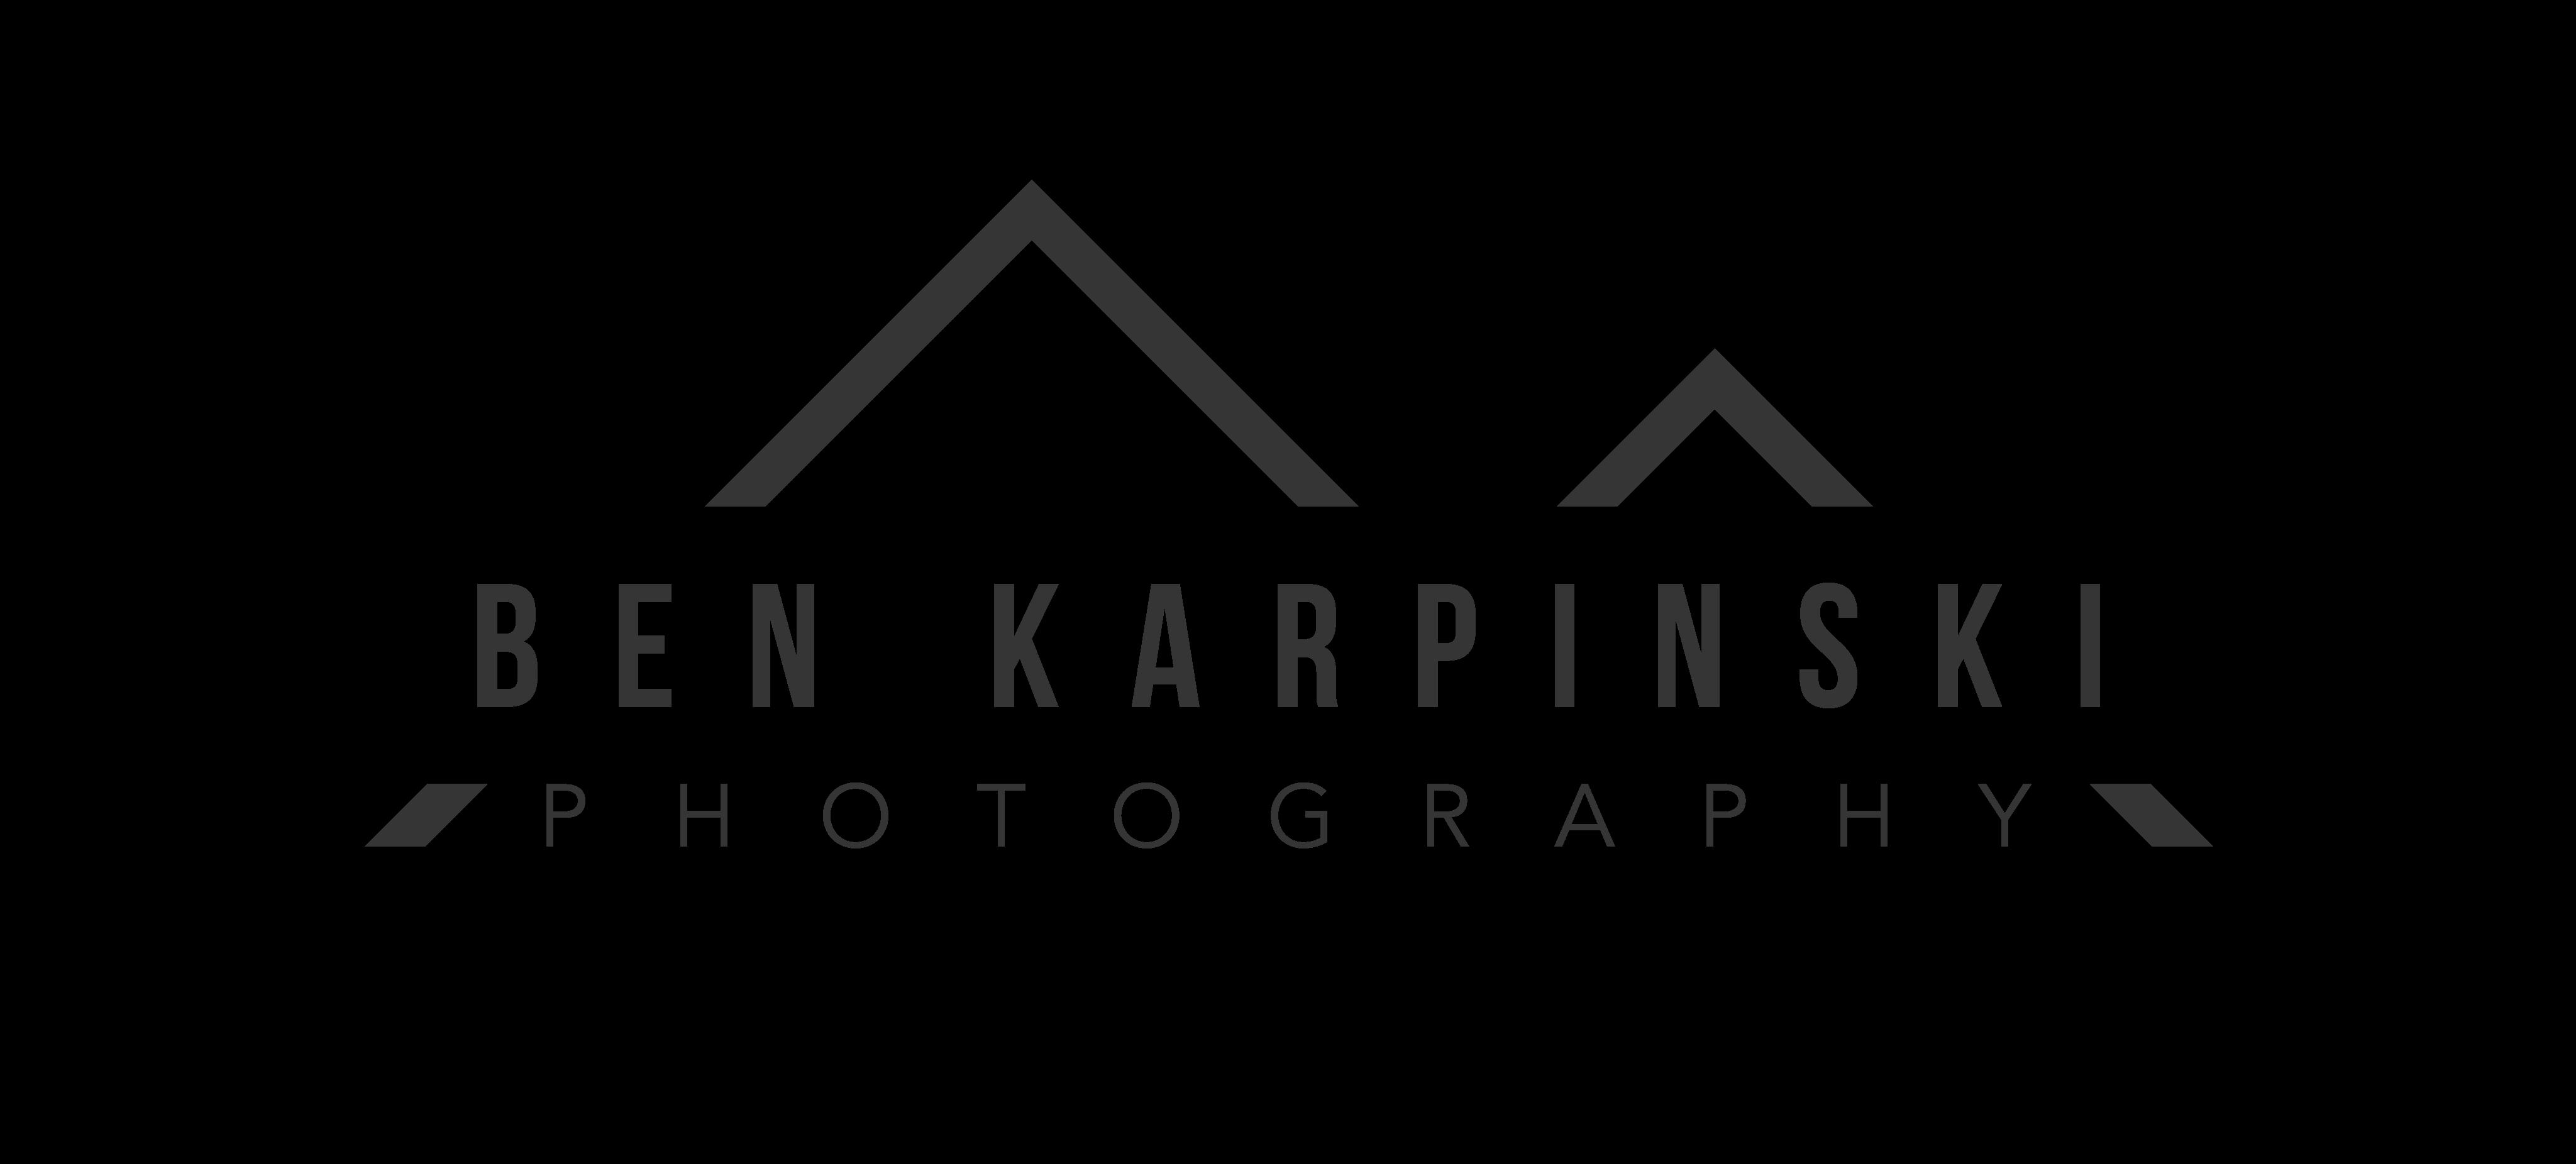 Ben Karpinski